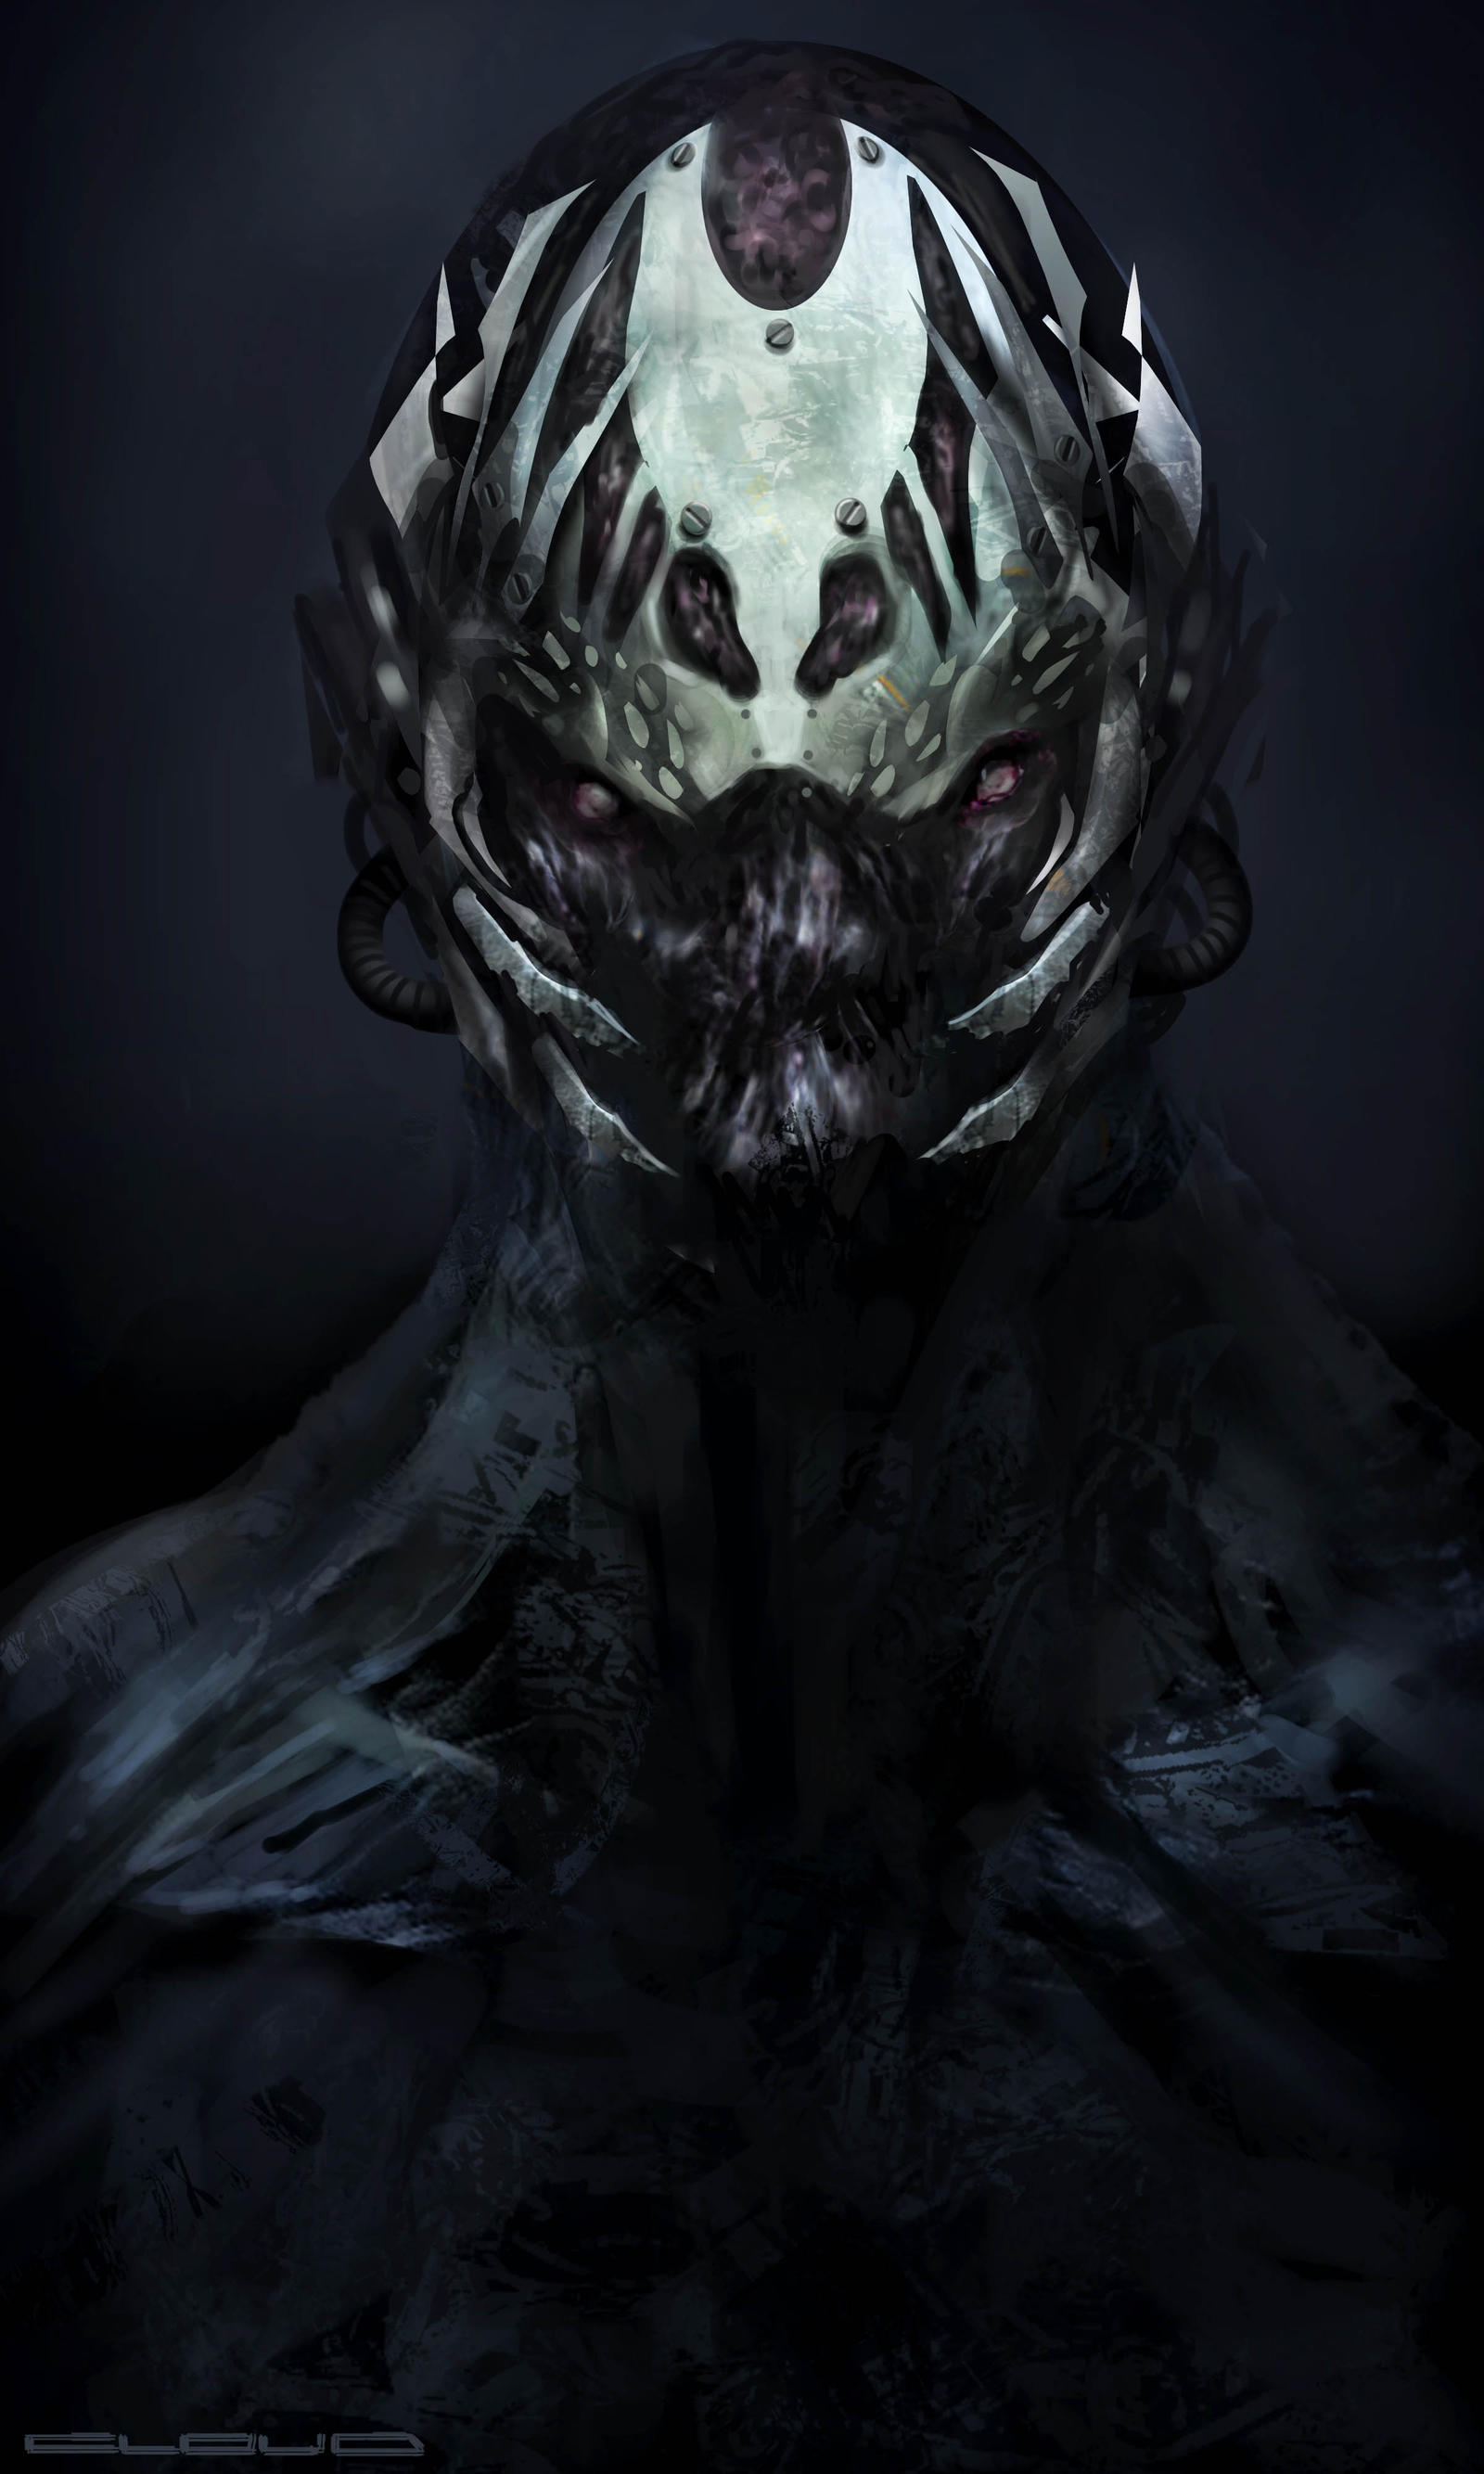 Creature dude by Darkcloud013